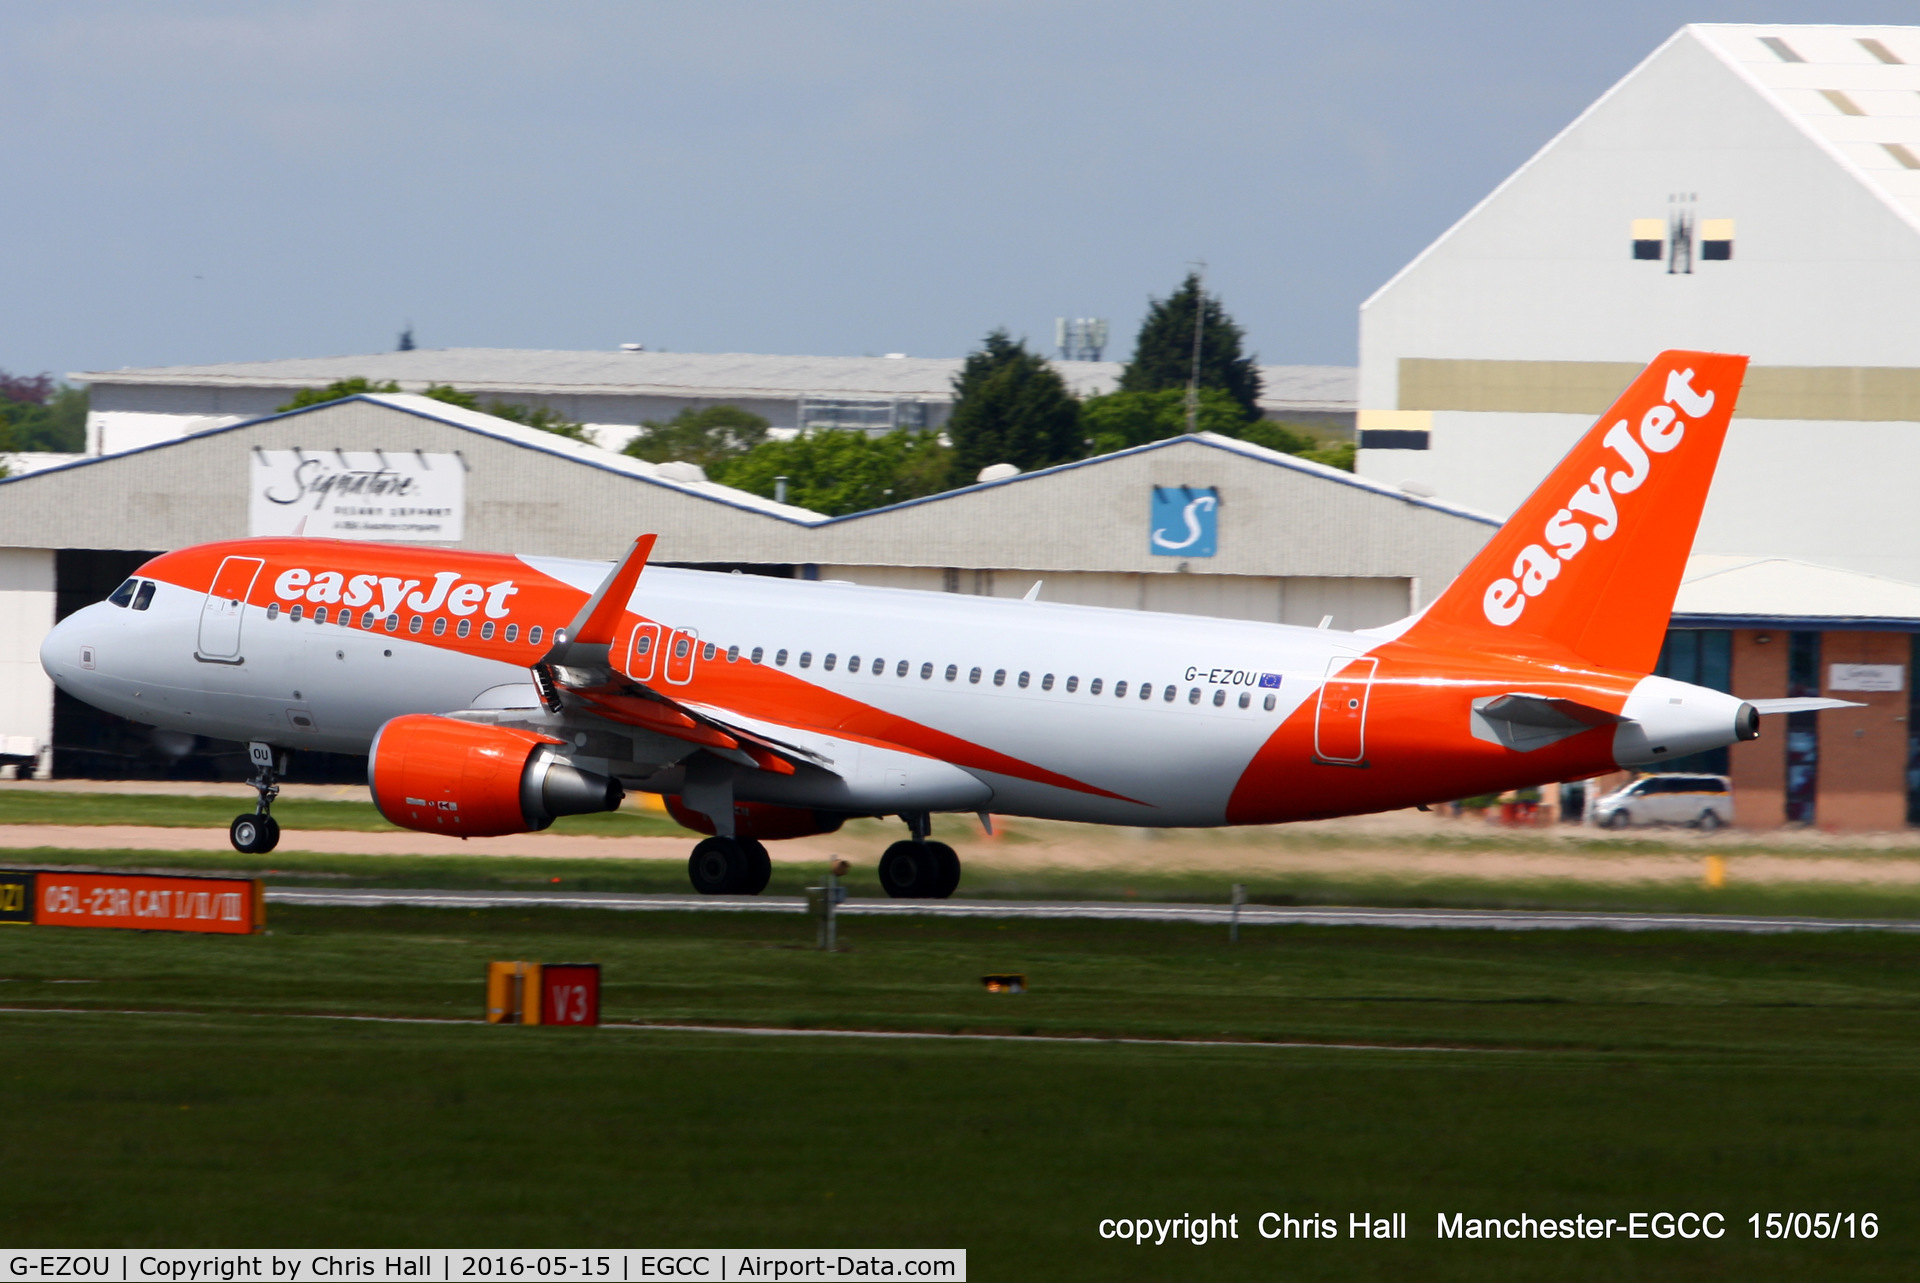 G-EZOU, 2015 Airbus A320-214 C/N 6754, easyJet